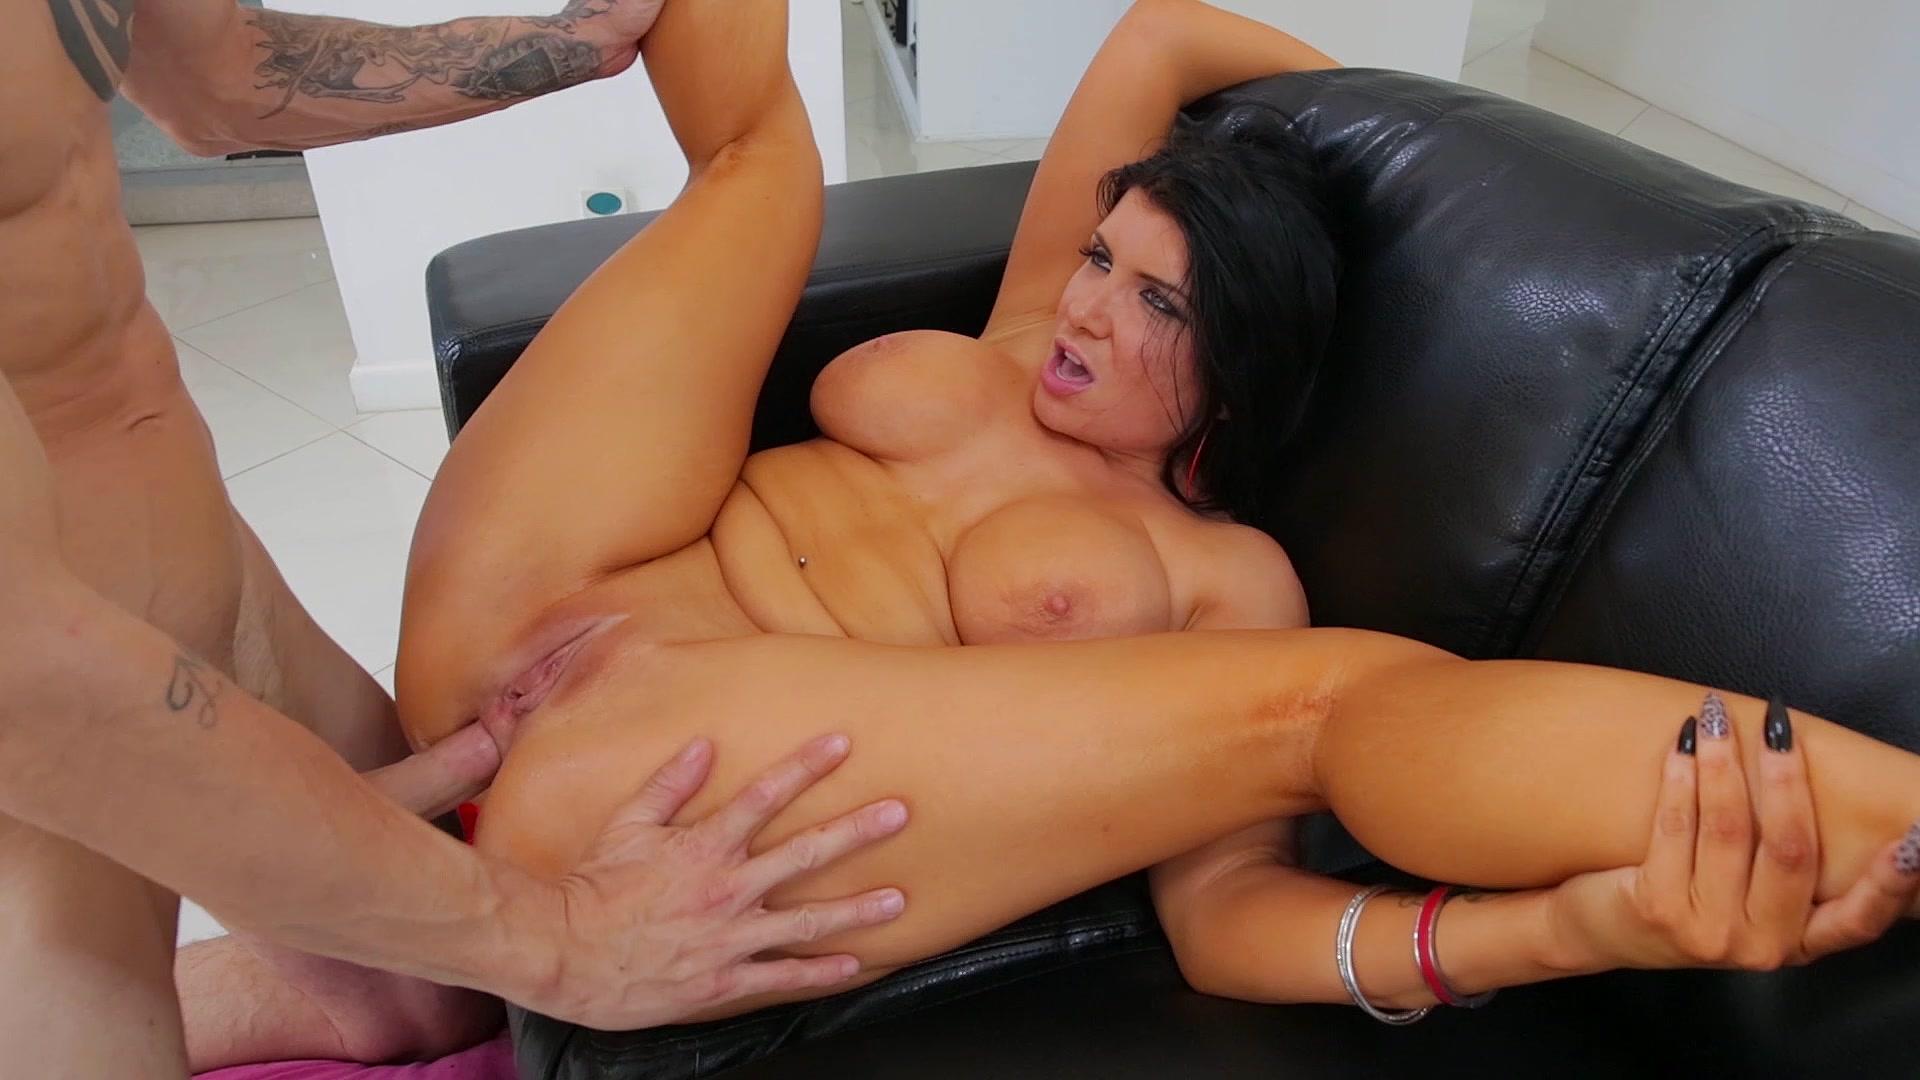 Онлайн видео секс порно hd согласен